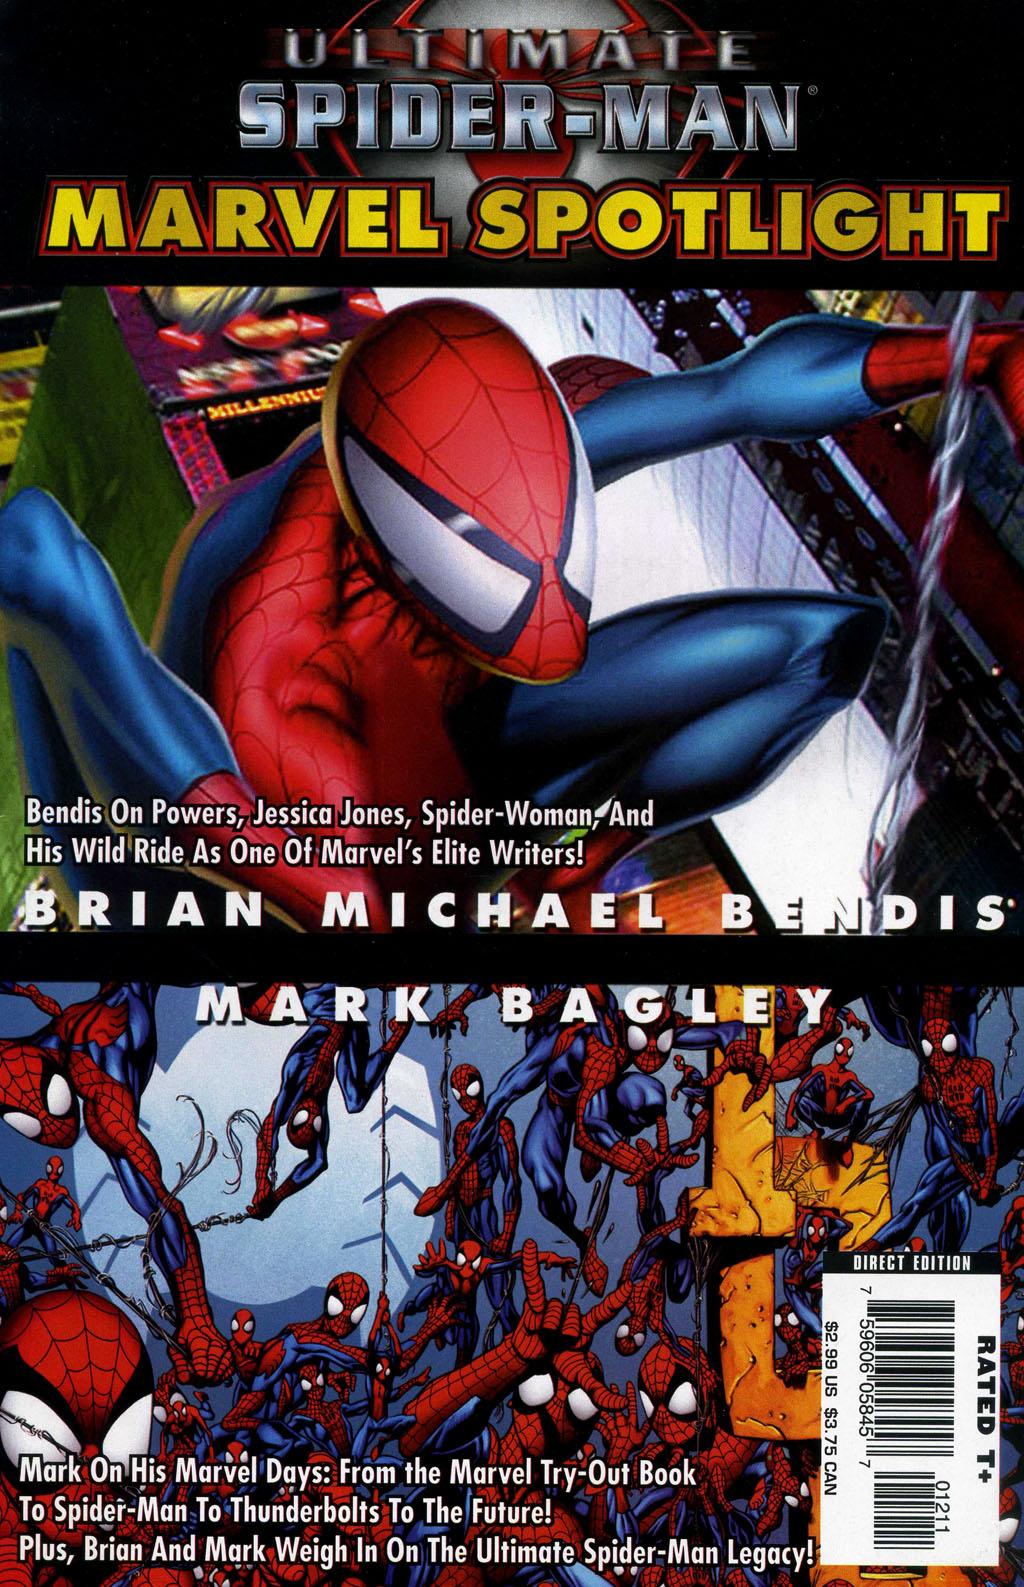 Marvel Spotlight: Brian Michael Bendis/Mark Bagley Vol 1